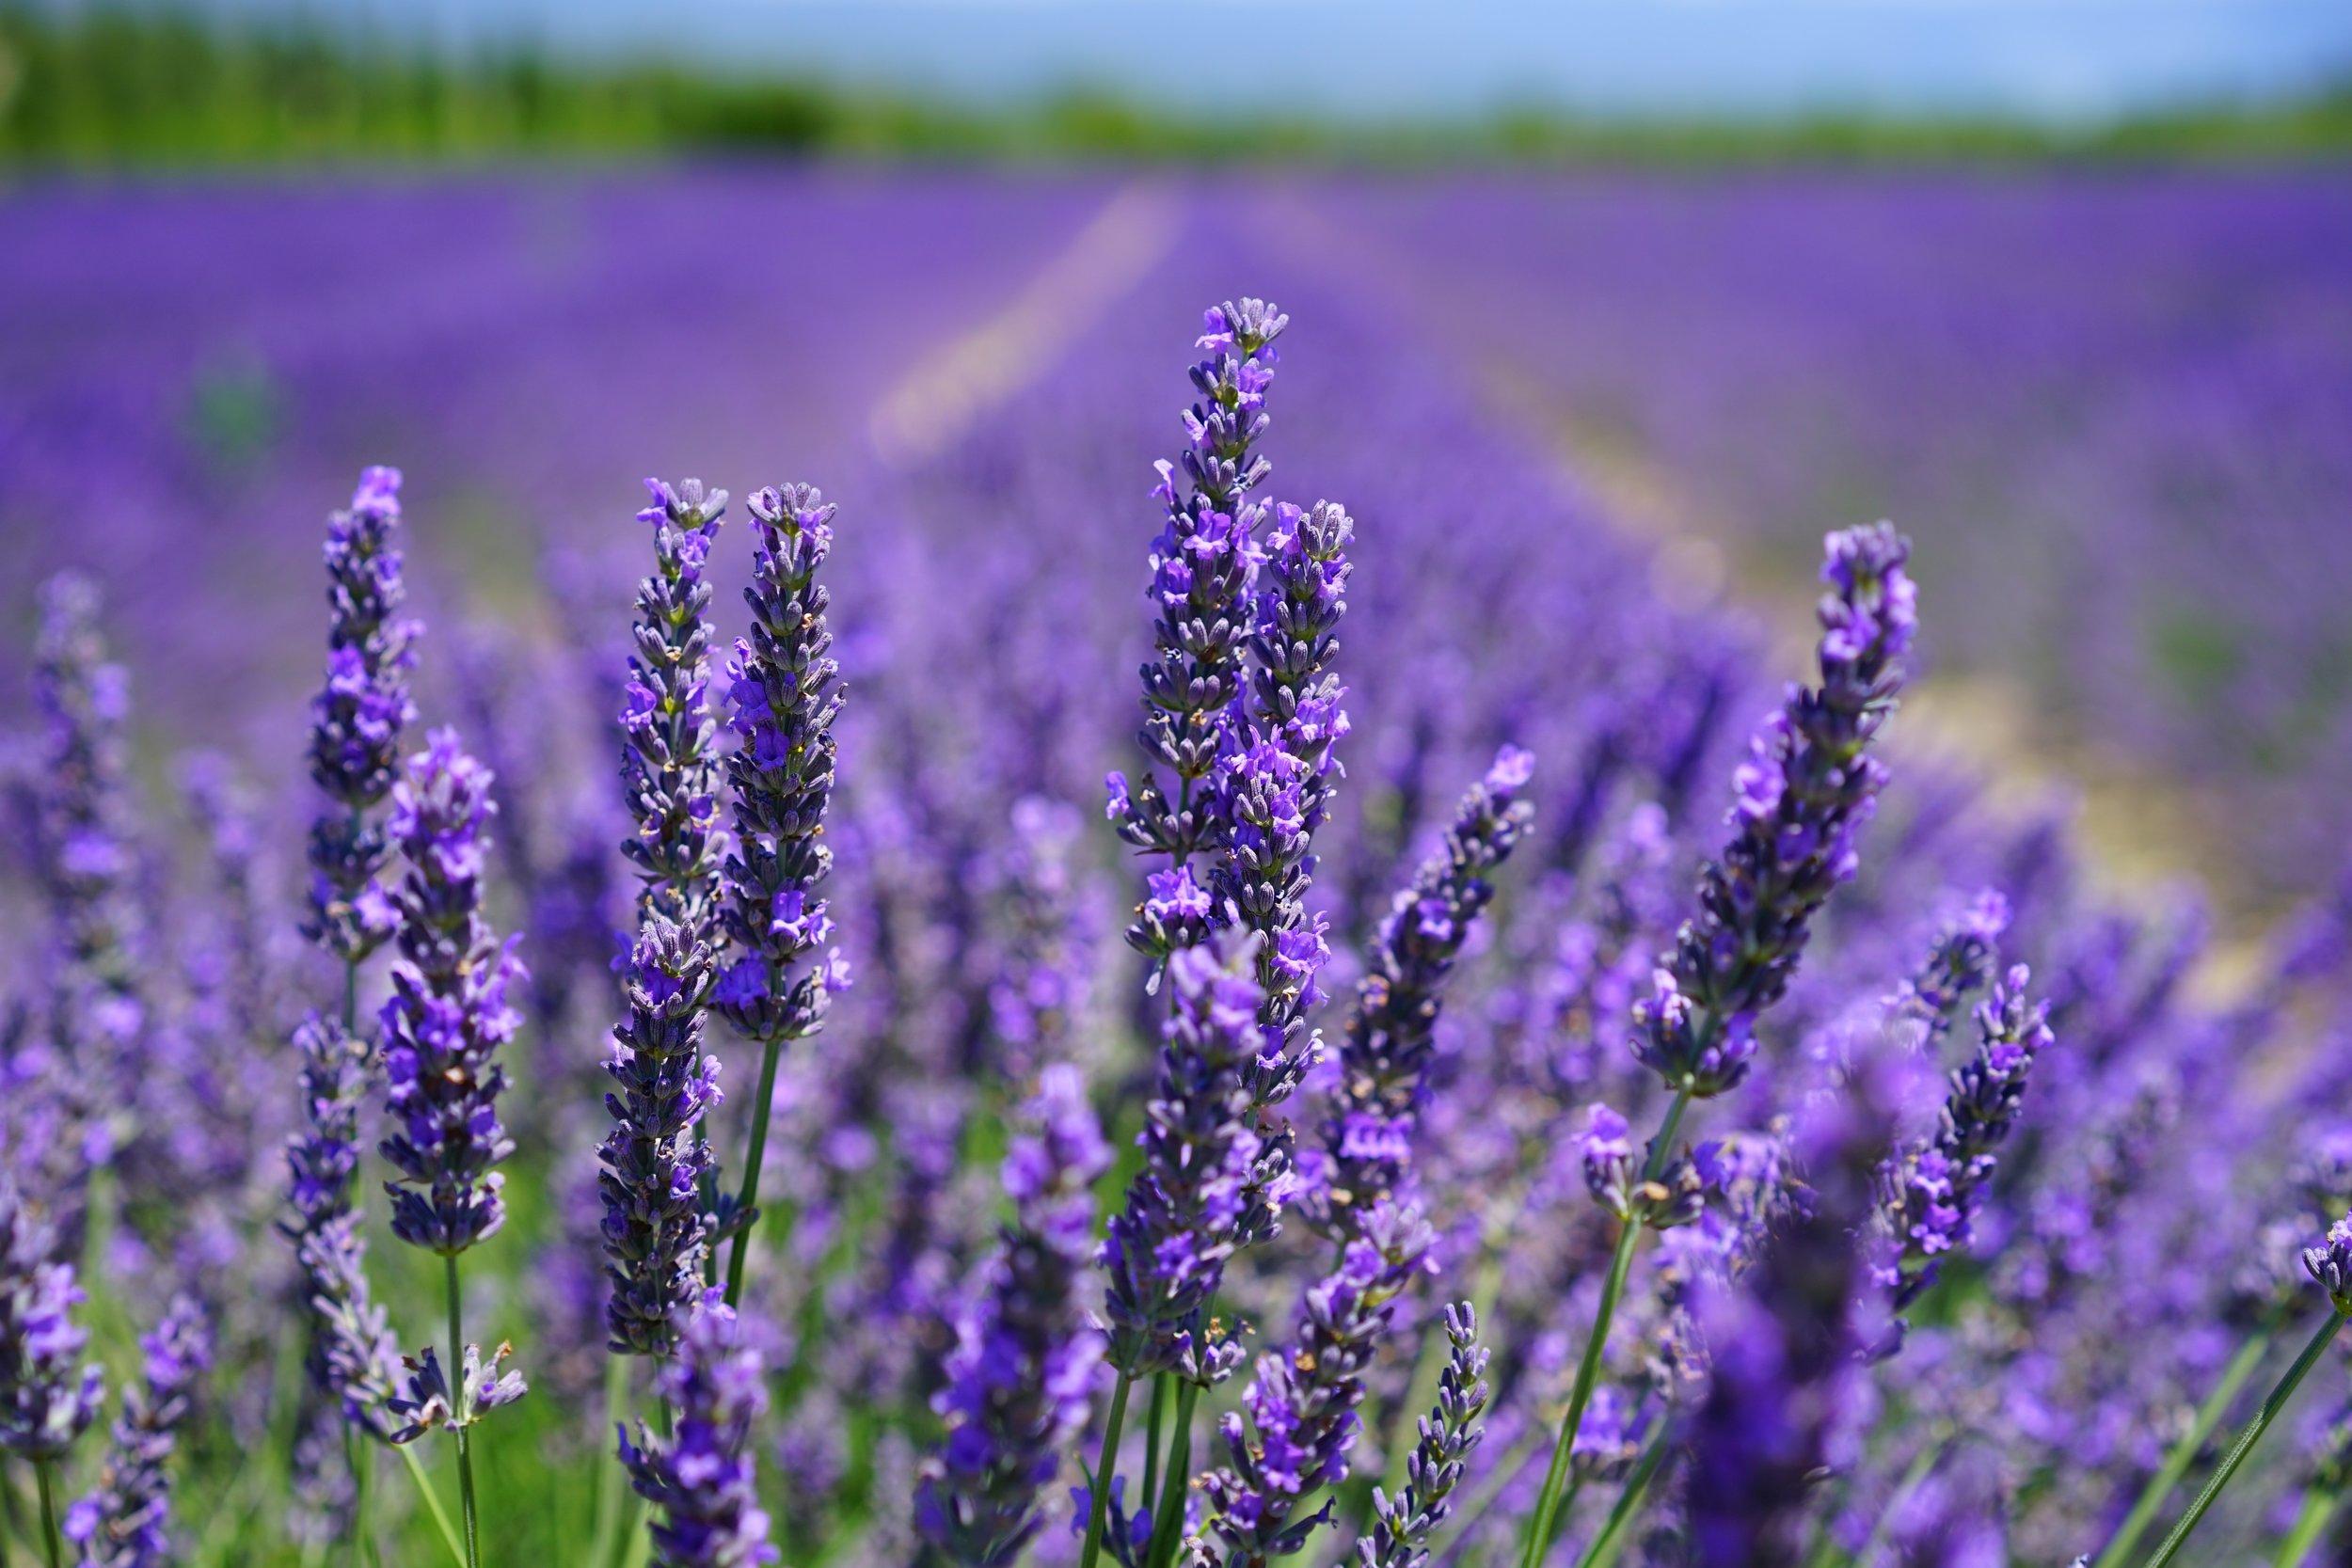 aroma-blooming-lavender-close-up-207518 (1).jpg